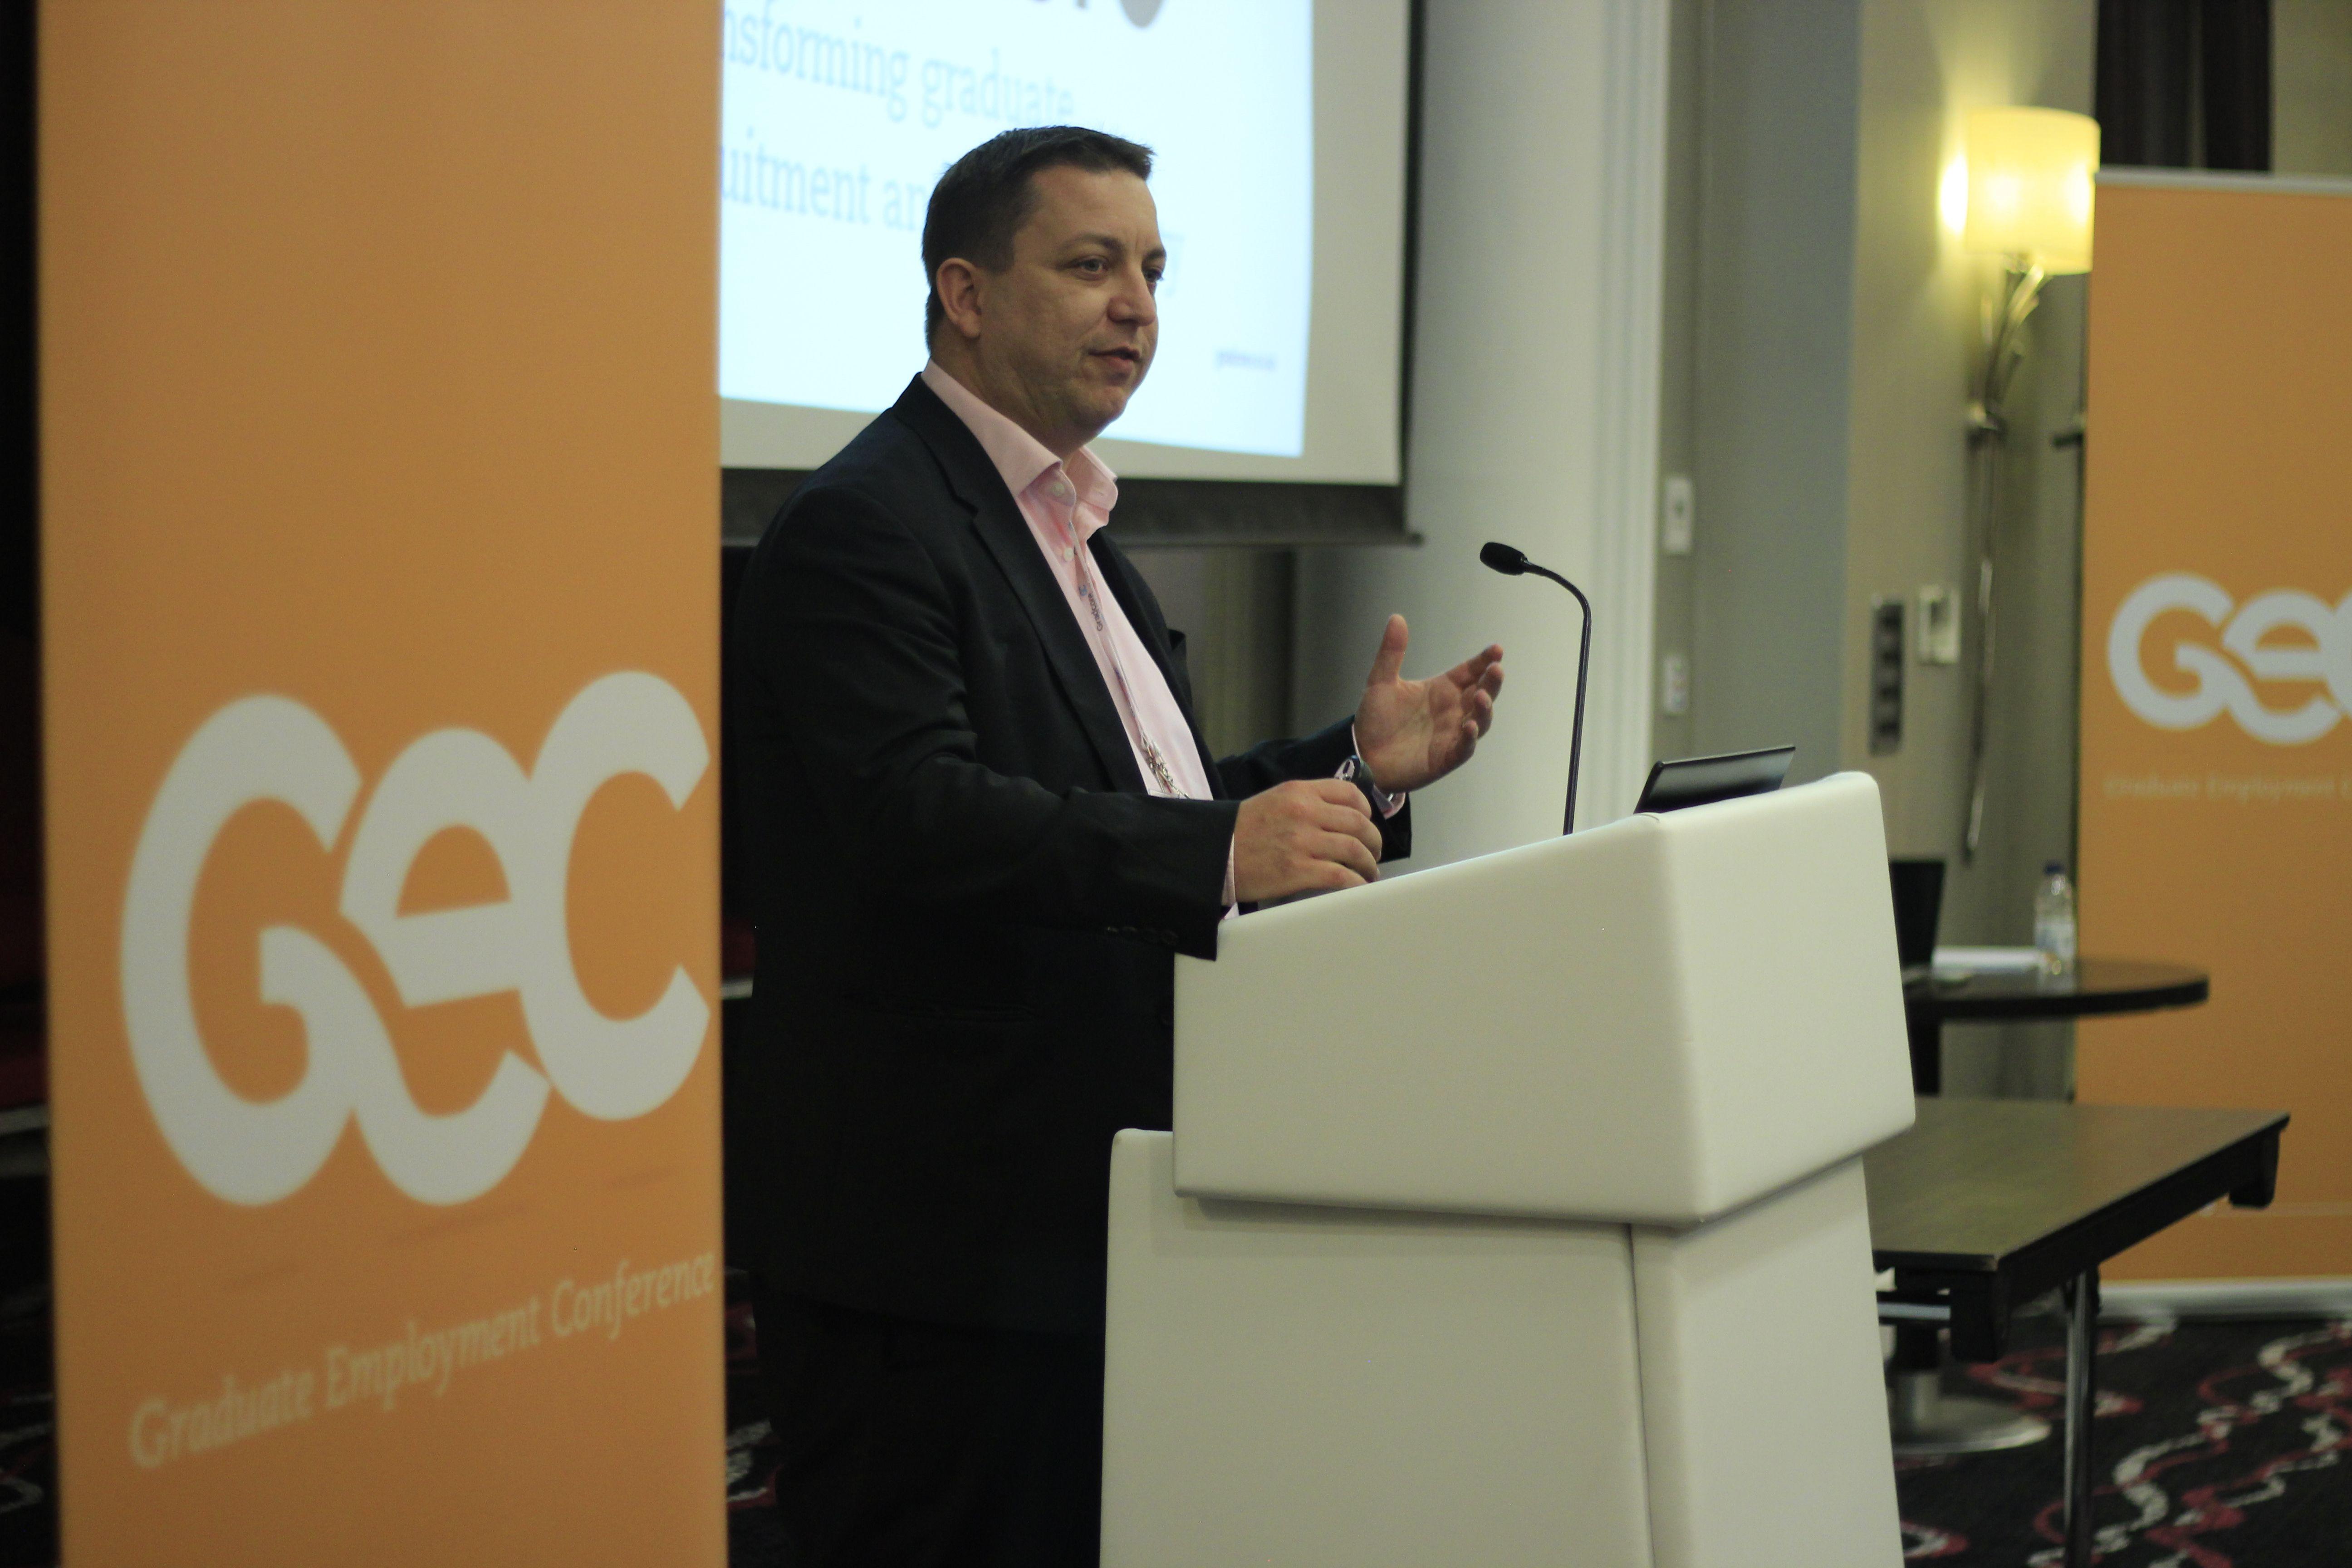 Martin Edmondson from Gradcore introducing Claire Cashmore